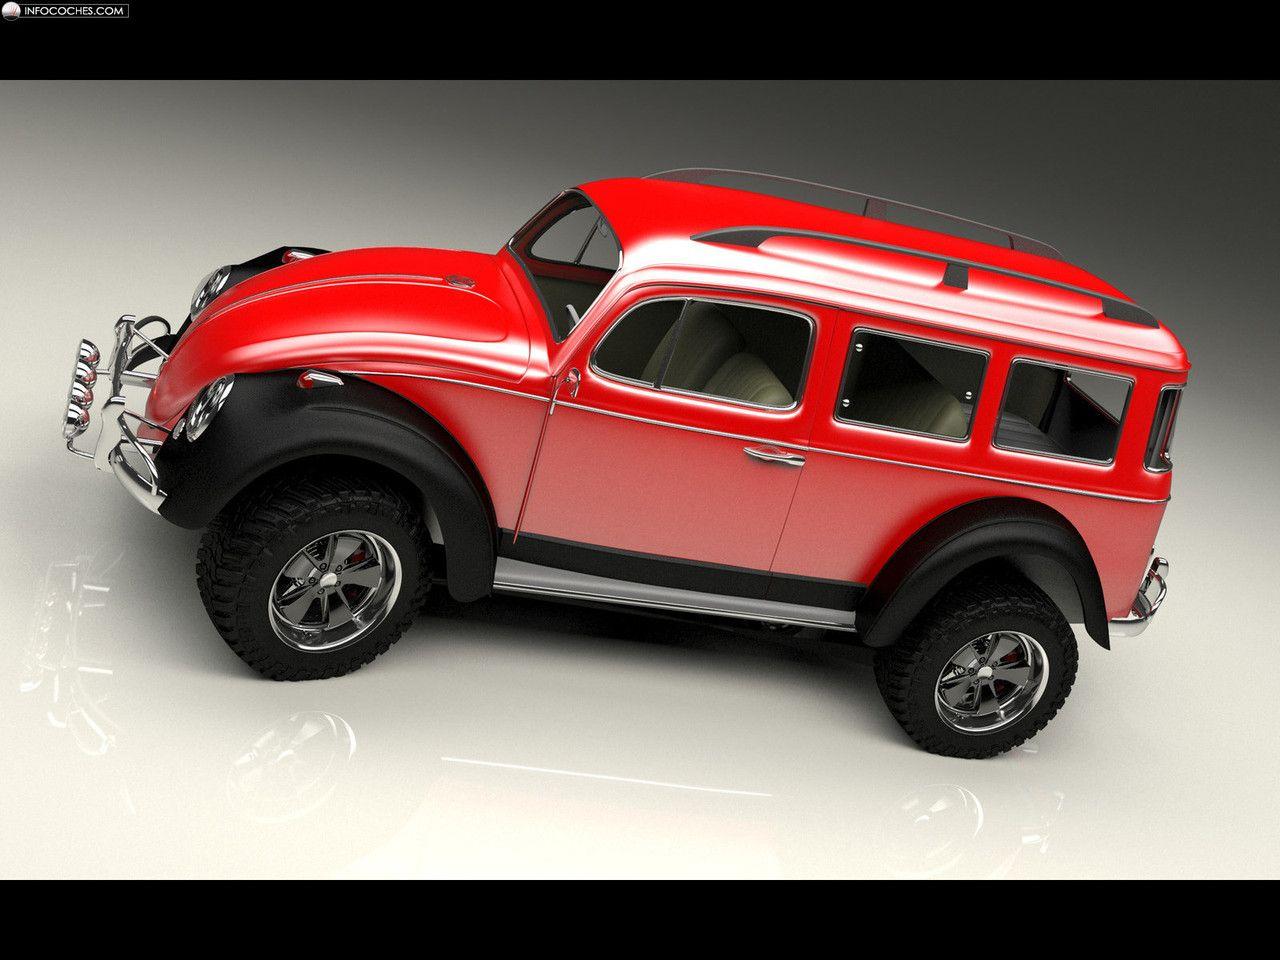 fotos del bo zolland volkswagen beetle 4x4 5 6 concept cars pinterest beetles 4x4 and. Black Bedroom Furniture Sets. Home Design Ideas